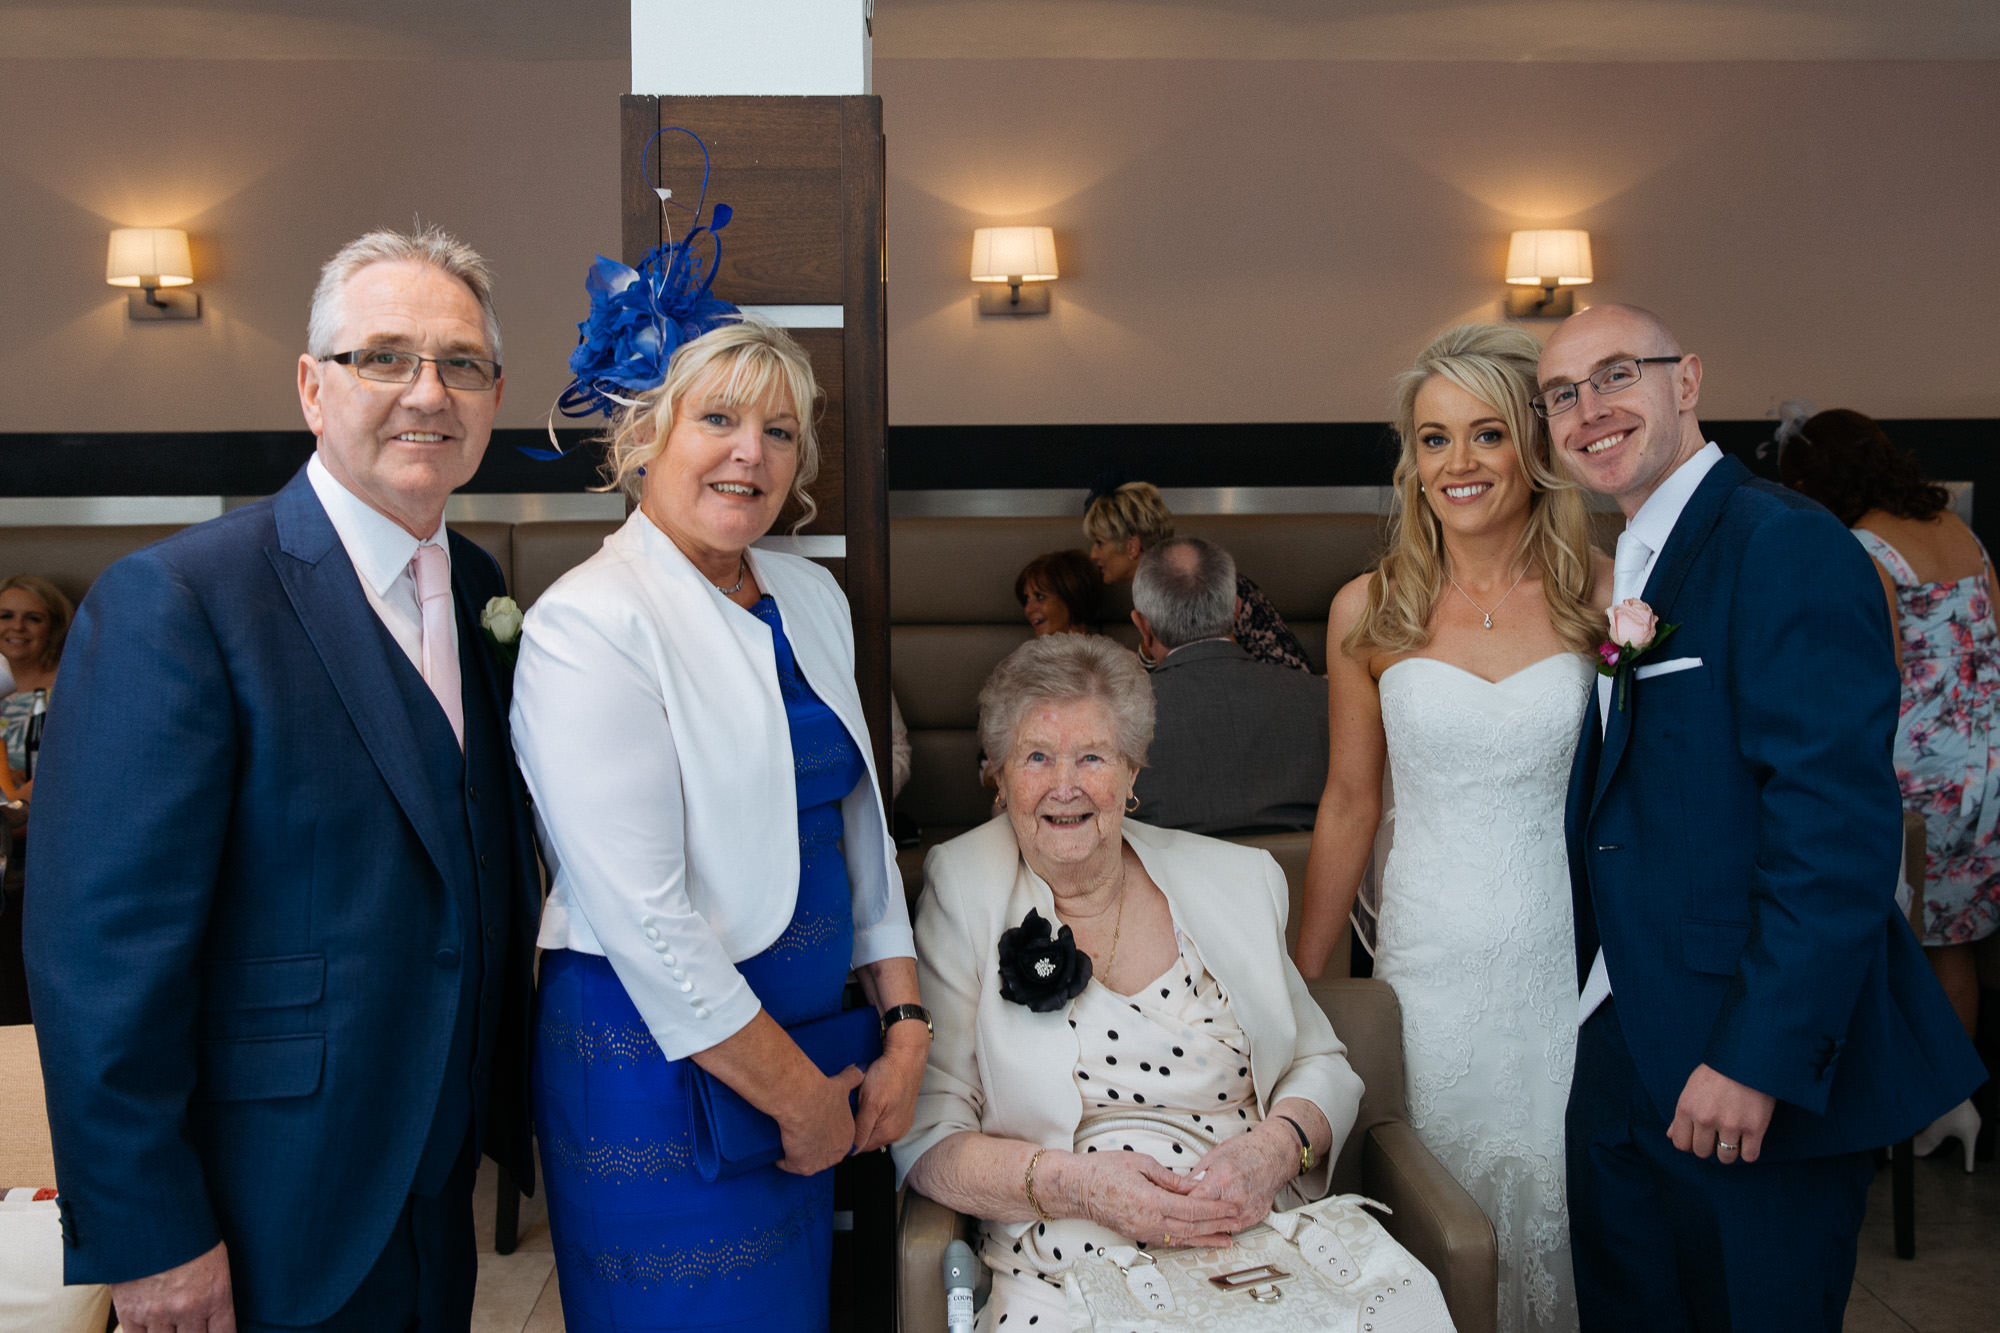 CLAIREBYRNEPHOTOGRAPHY-WEDDING-Ireland-tulffaris-alternative-fun-Lisa-terry-33.jpg